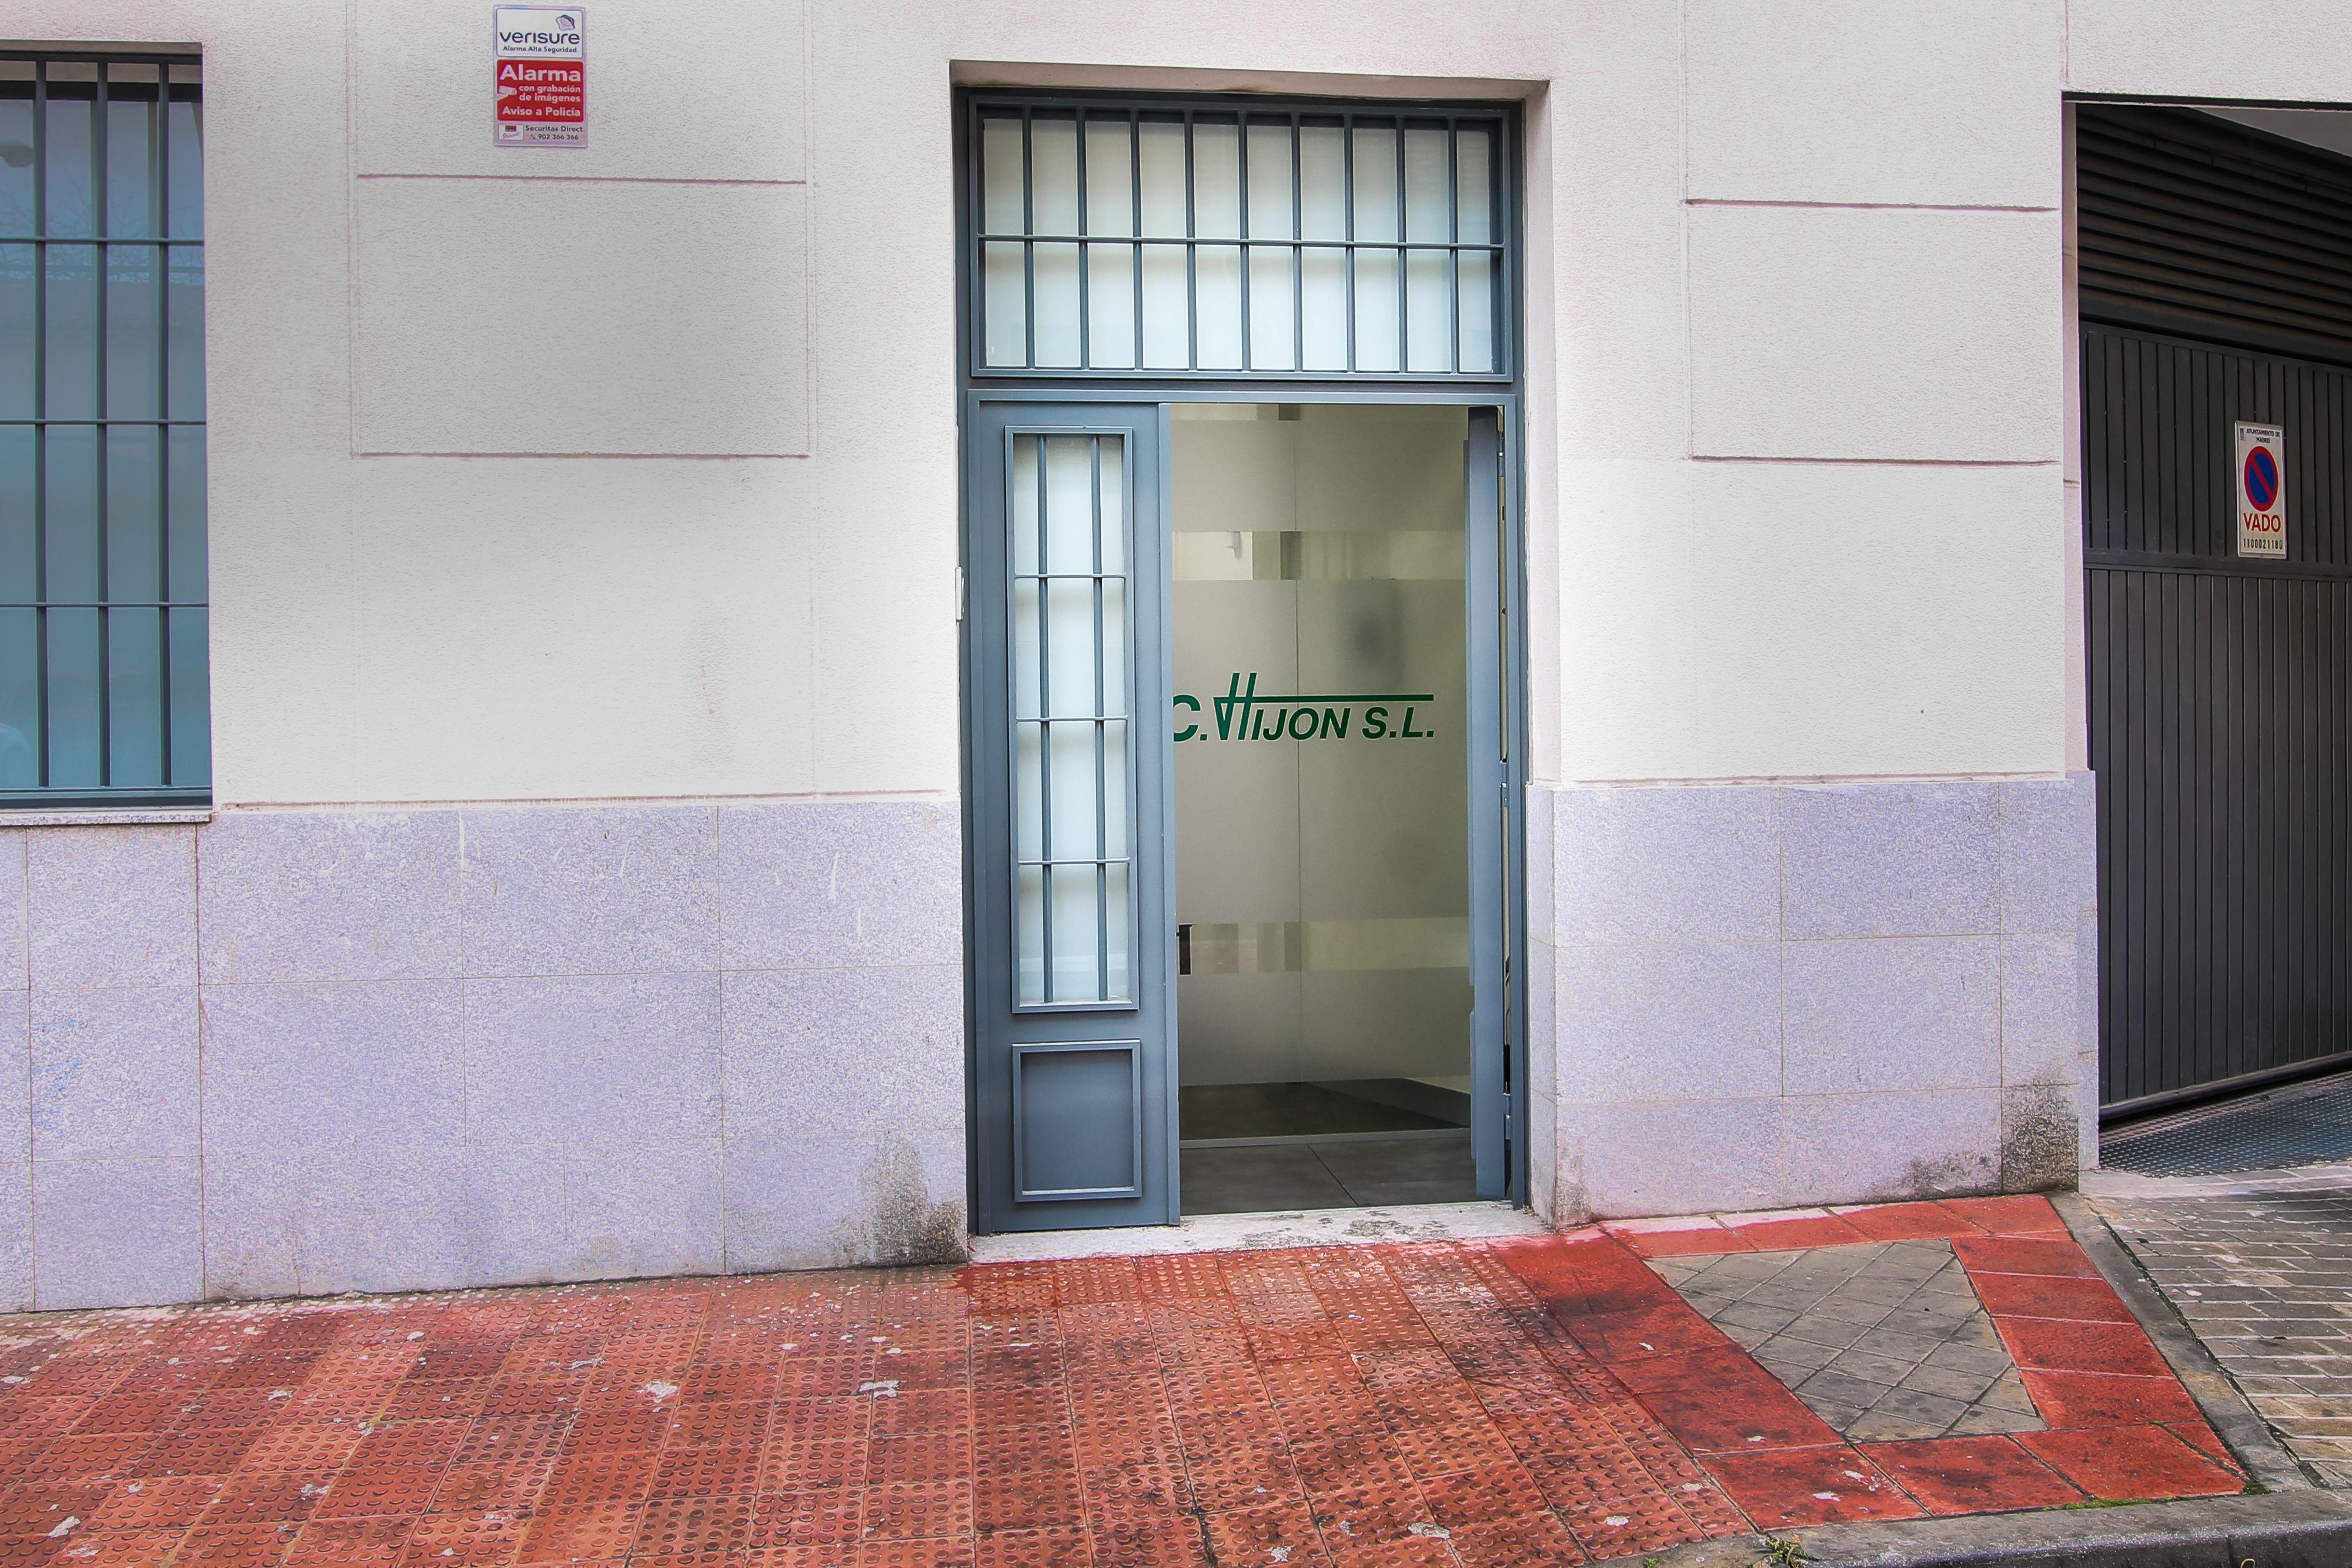 Foto 1 de inspecci n t cnica de edificios en madrid c for Canal isabel ii oficina virtual